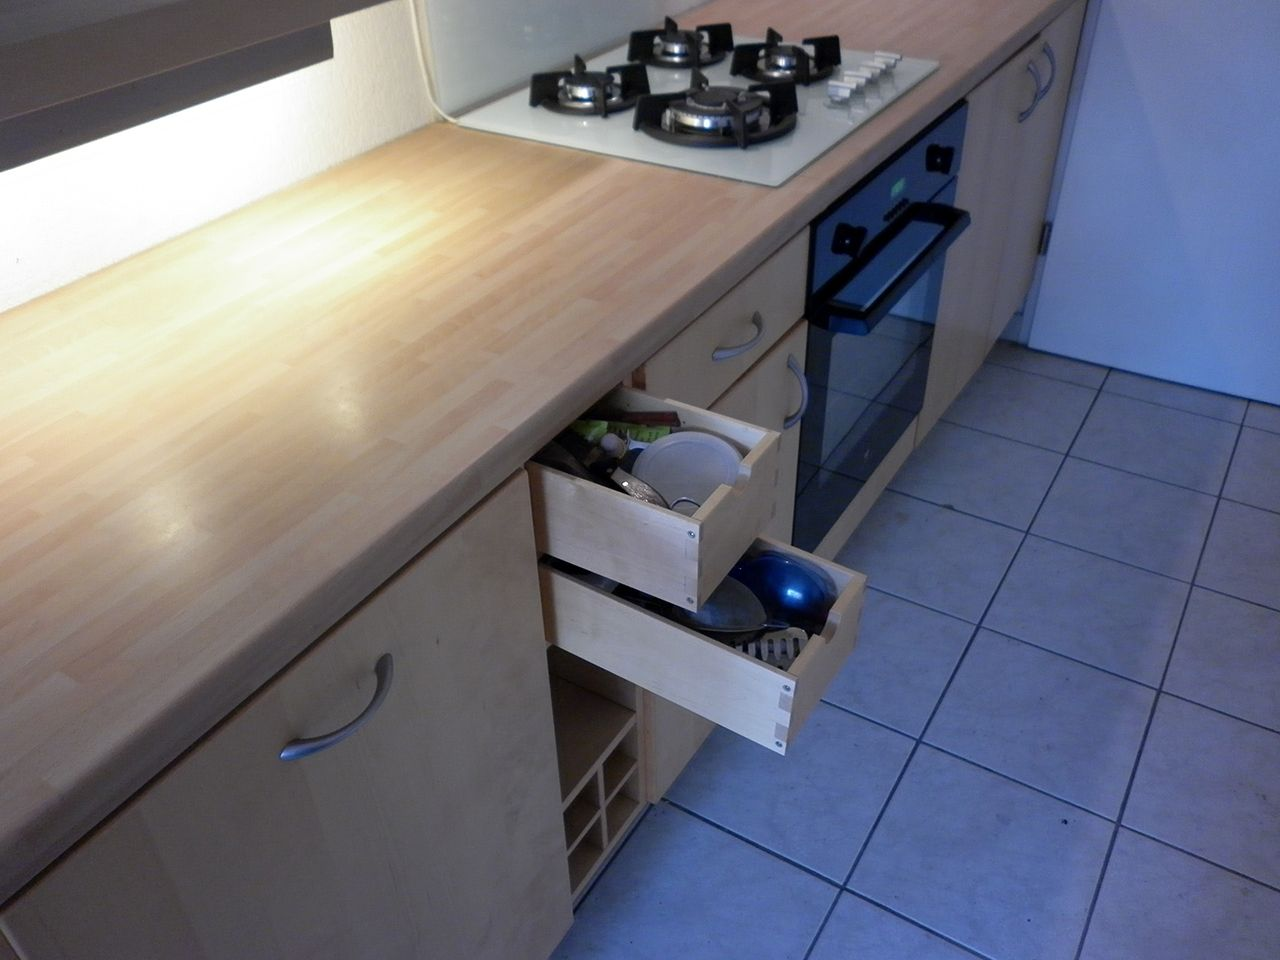 vendu prix 250 cuisine ikea avec 5 l ments bas comprenant 1x meuble range casseroles. Black Bedroom Furniture Sets. Home Design Ideas